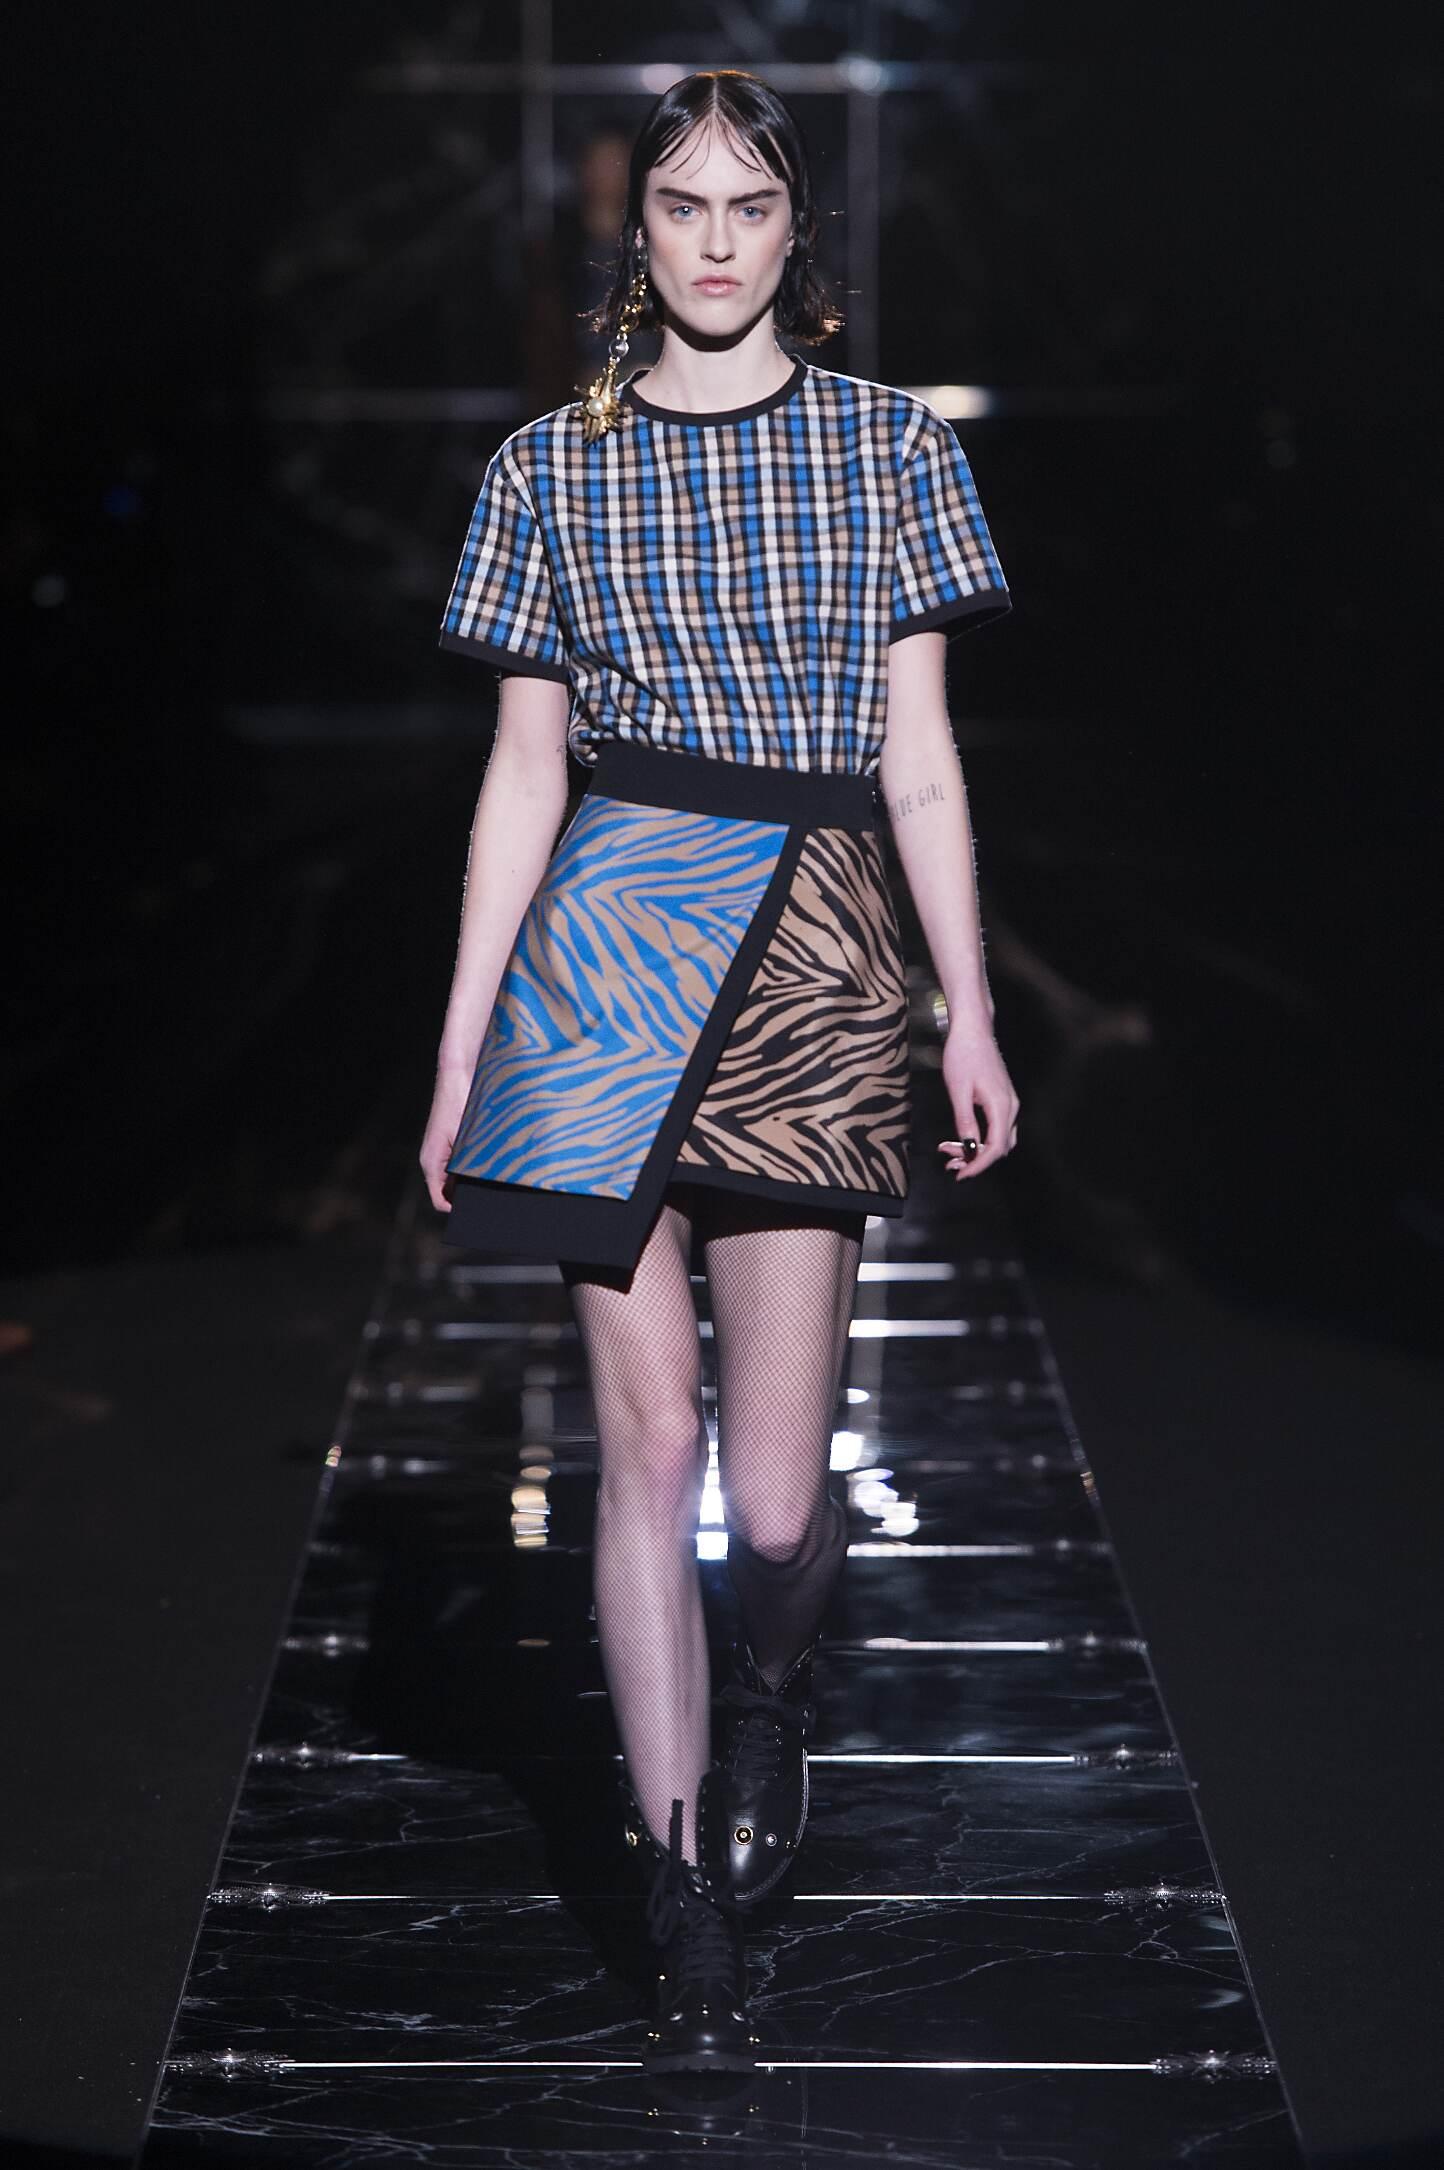 Catwalk Fausto Puglisi Fall Winter 2015 16 Women's Collection Milan Fashion Week